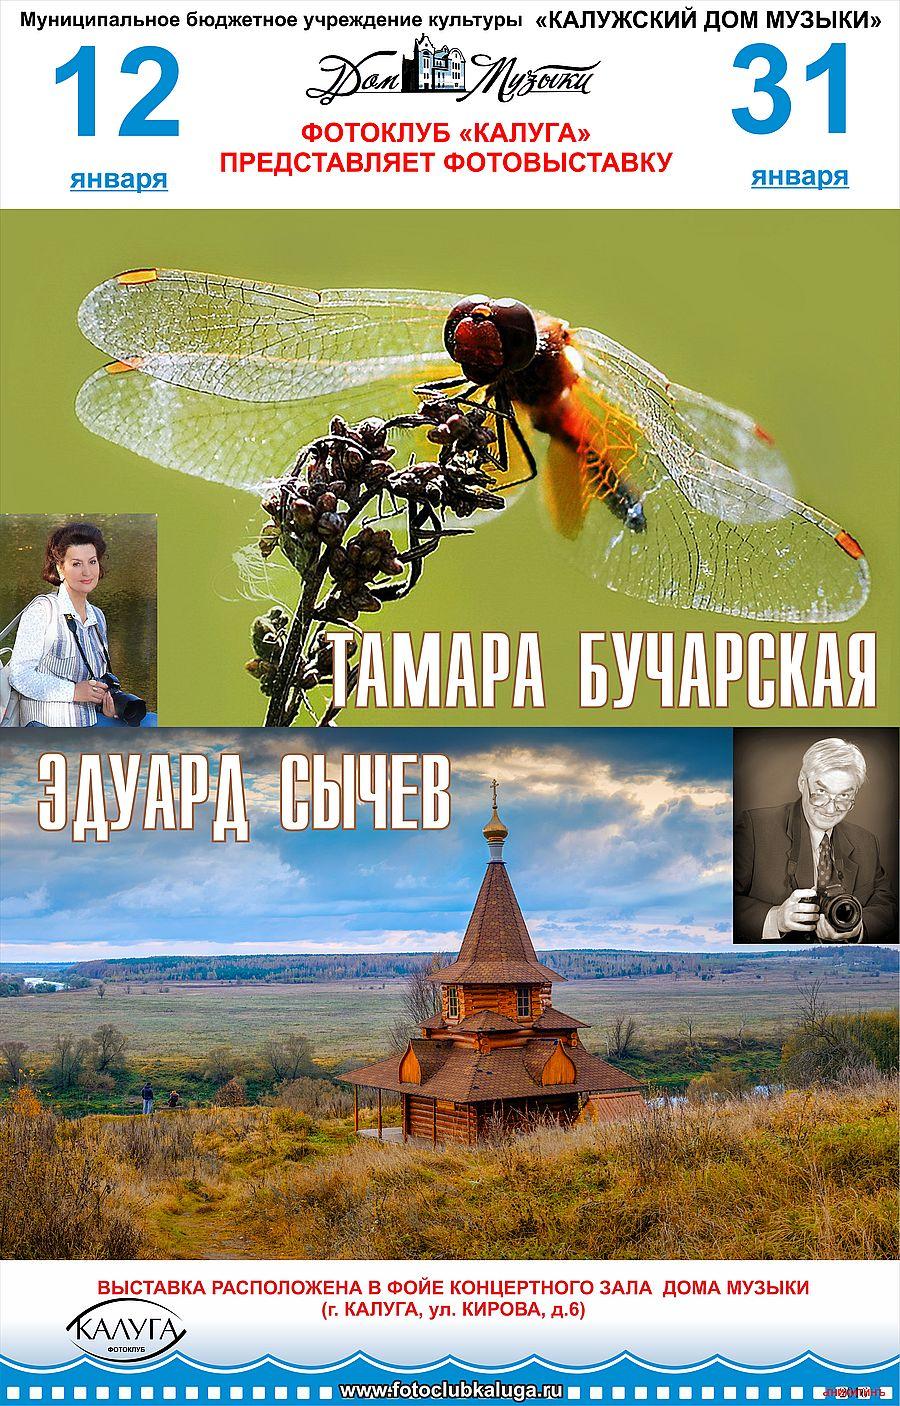 Выставка фотоклуба «Калуга» (Эдуард Сычёв и Тамара Бучарская)